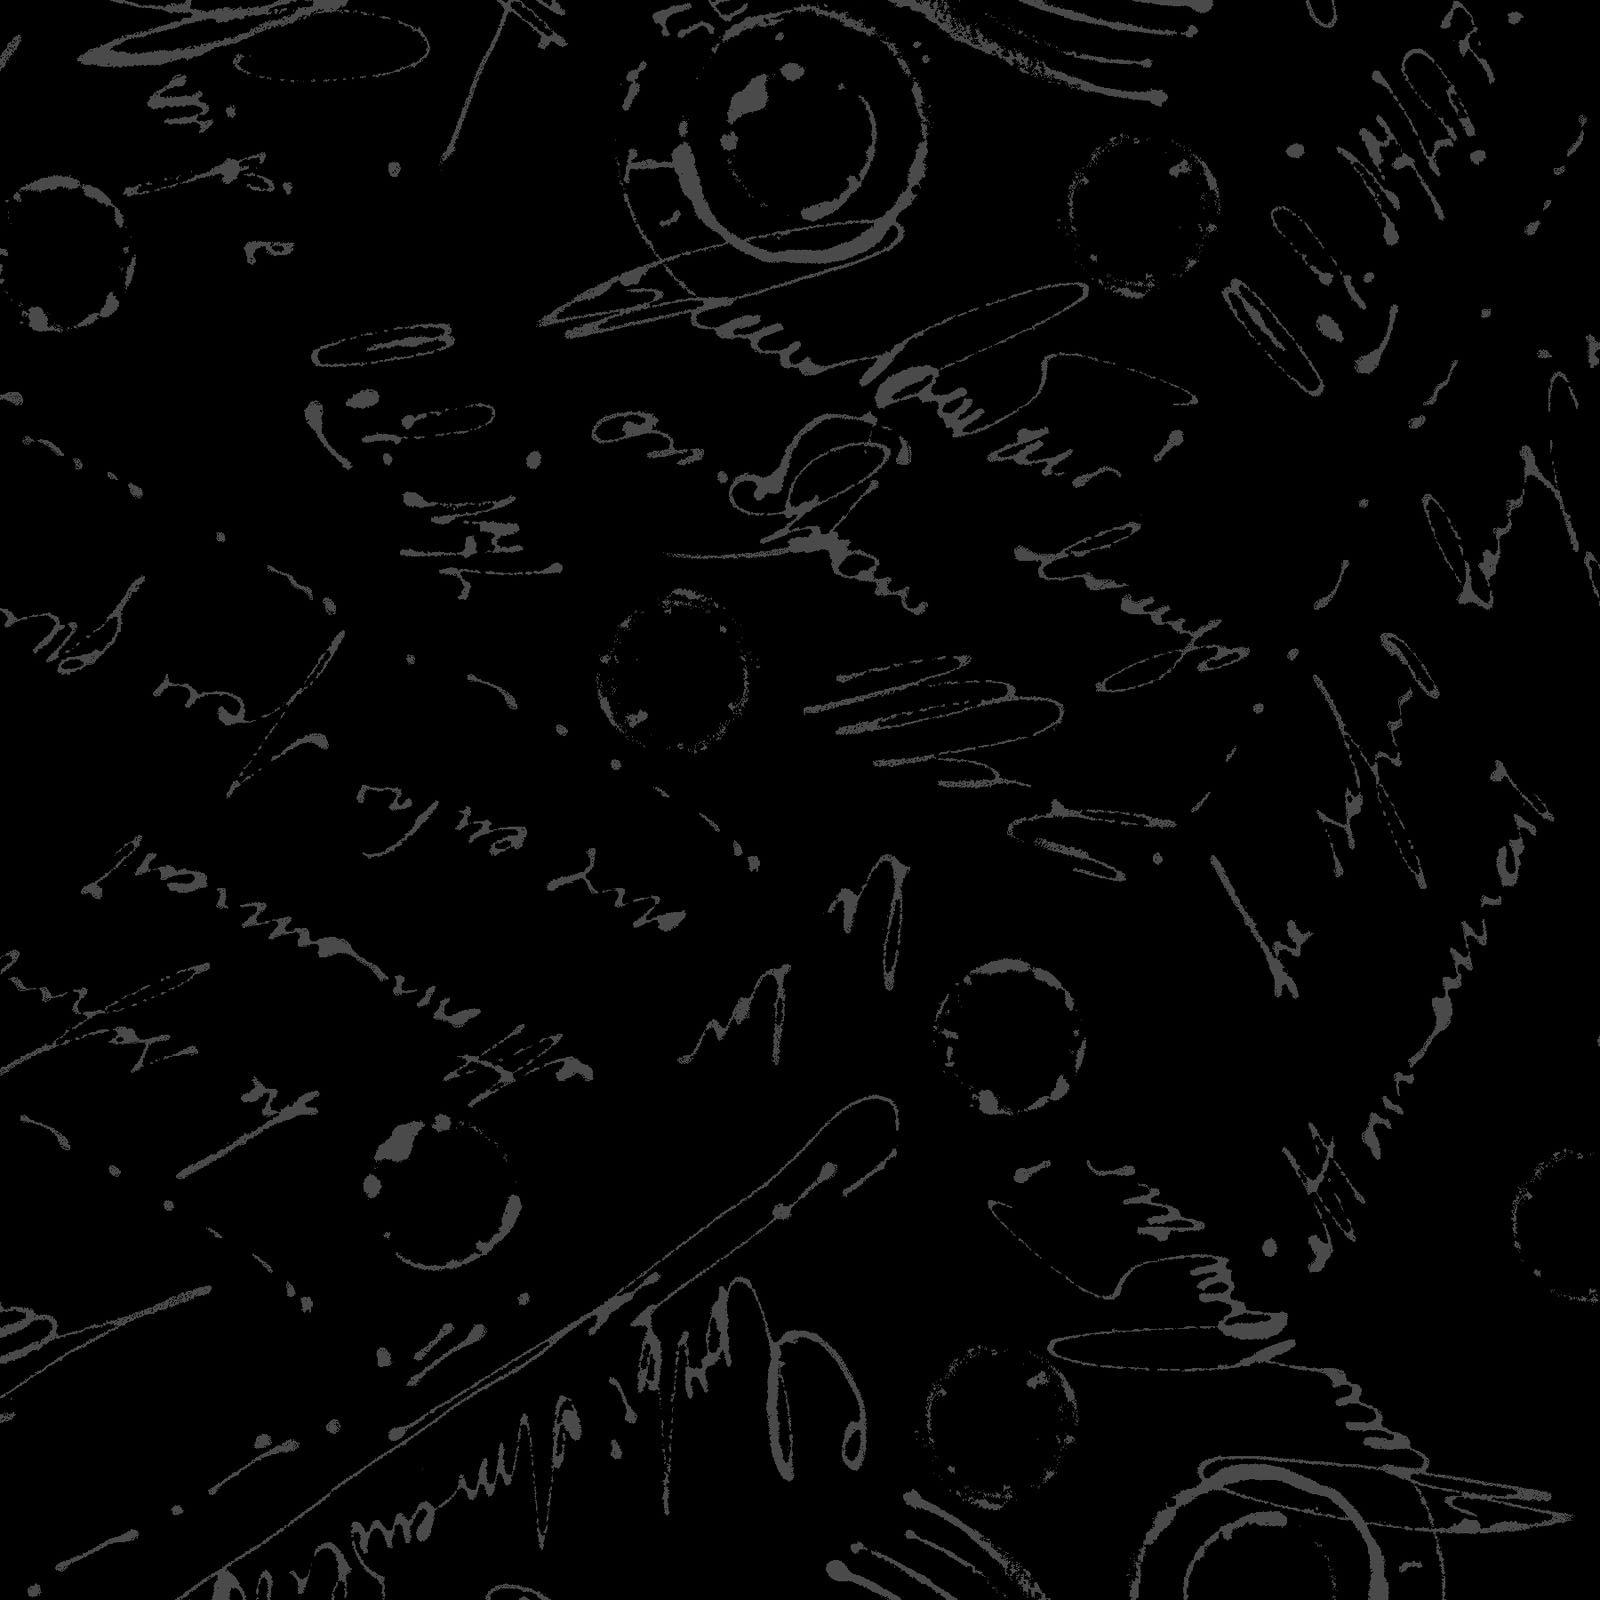 EESC-314 J - IN THE BLACK BY MAYWOOD SCRIPT BLACK ON BLACK